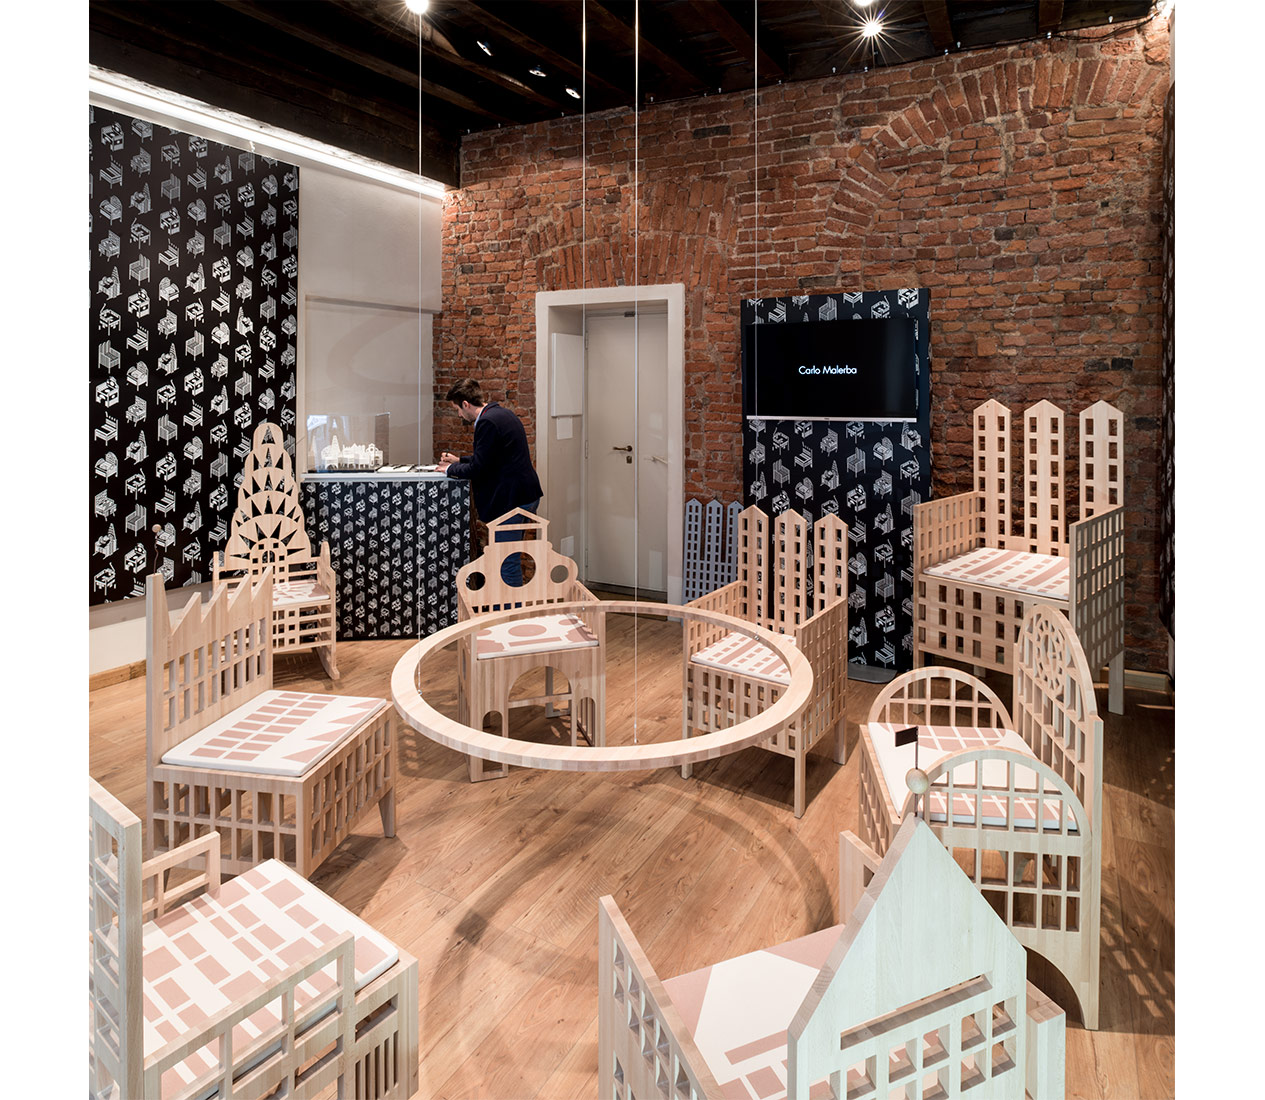 marco-tacchini-photographer-village-chairs-milano_06